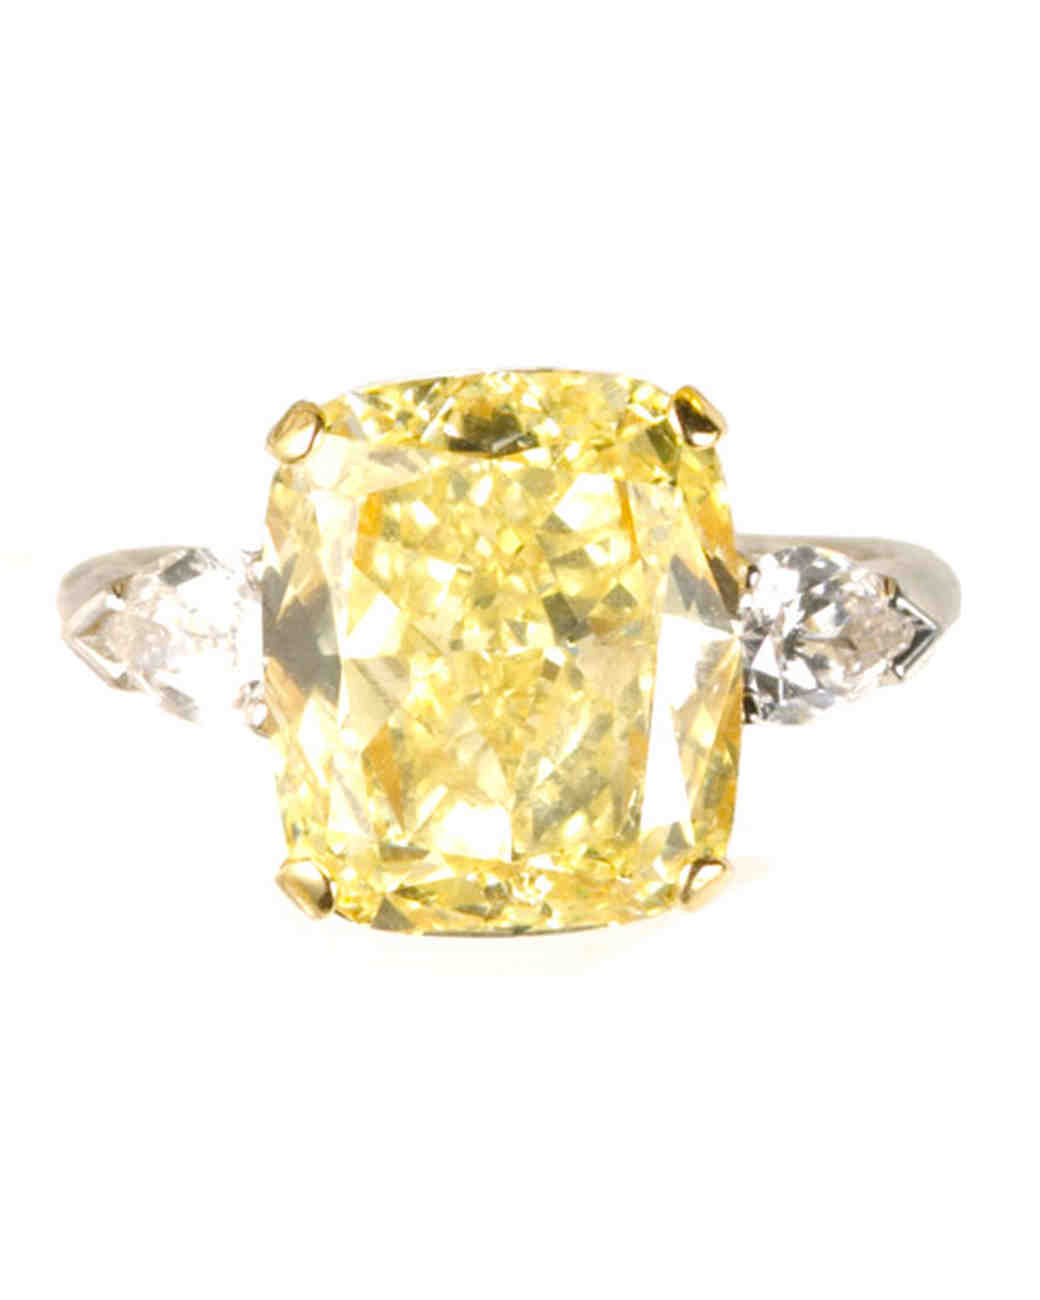 msw_sum10_yellow_ring_graff.jpg